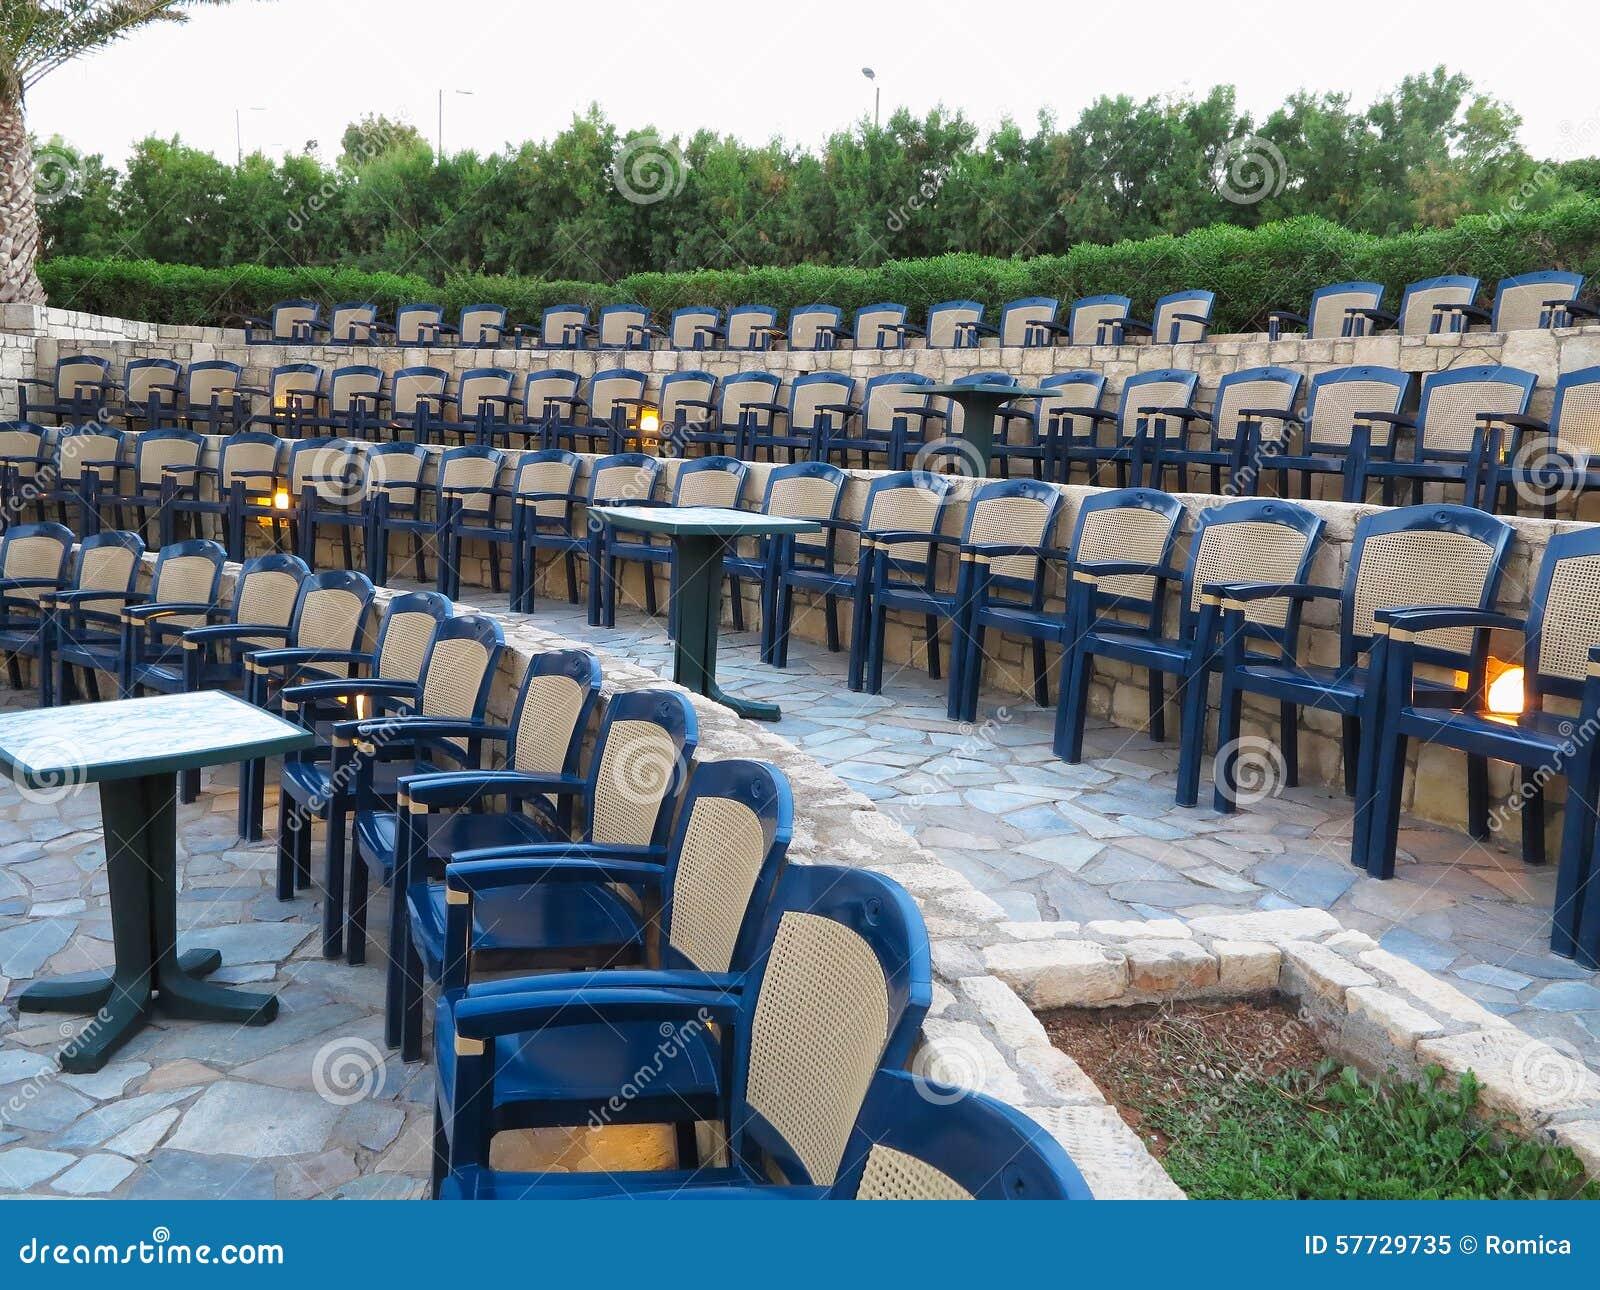 Terrific Modern Amphitheater Plastic Chairs And Palm Trees In Greece Frankydiablos Diy Chair Ideas Frankydiabloscom